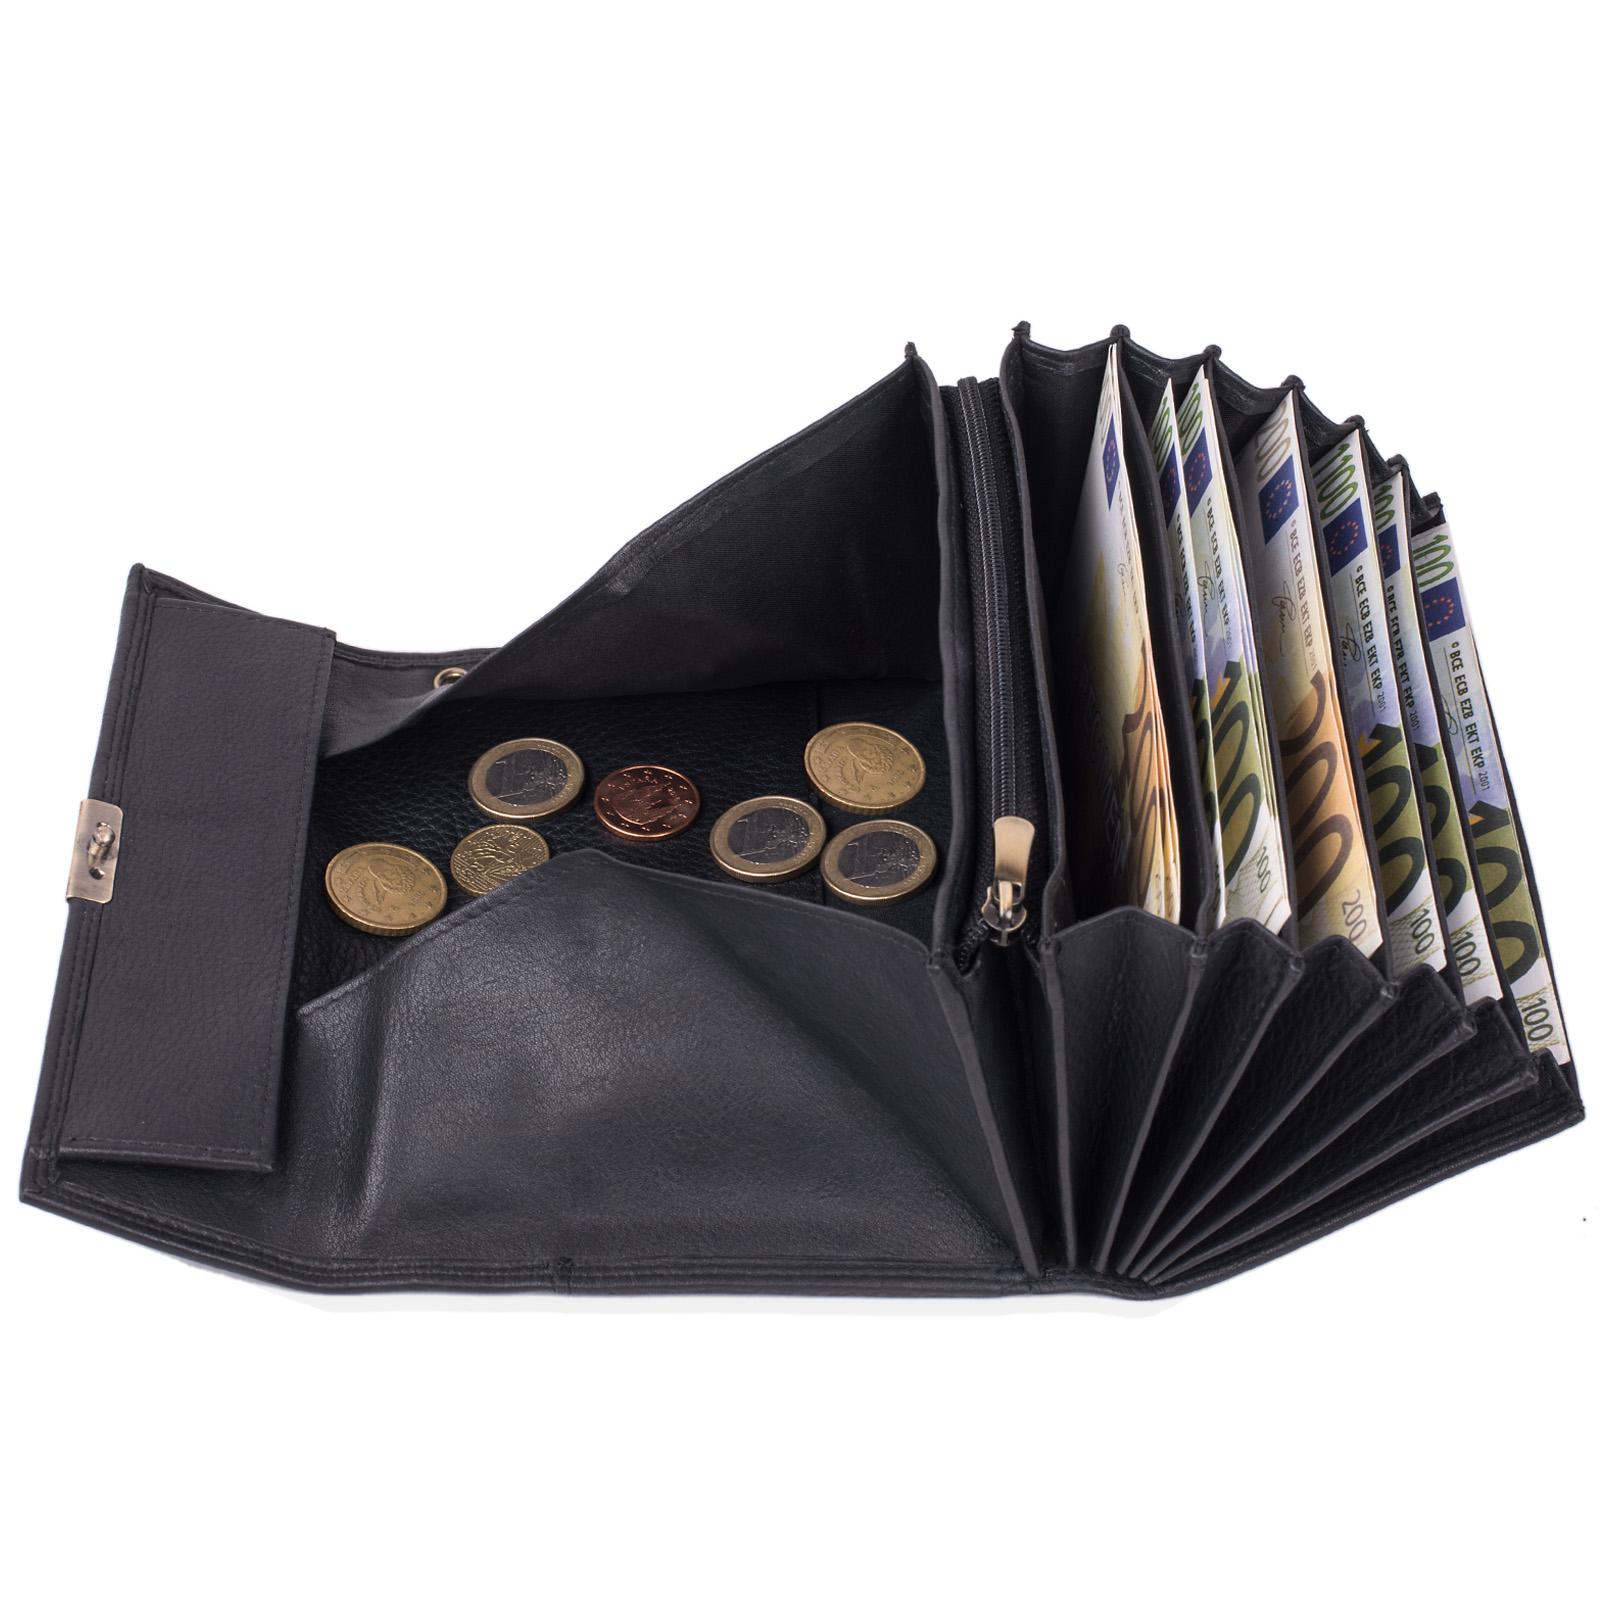 Kellner Set Geldbörse groß Vintage Leder Kleingeldfach